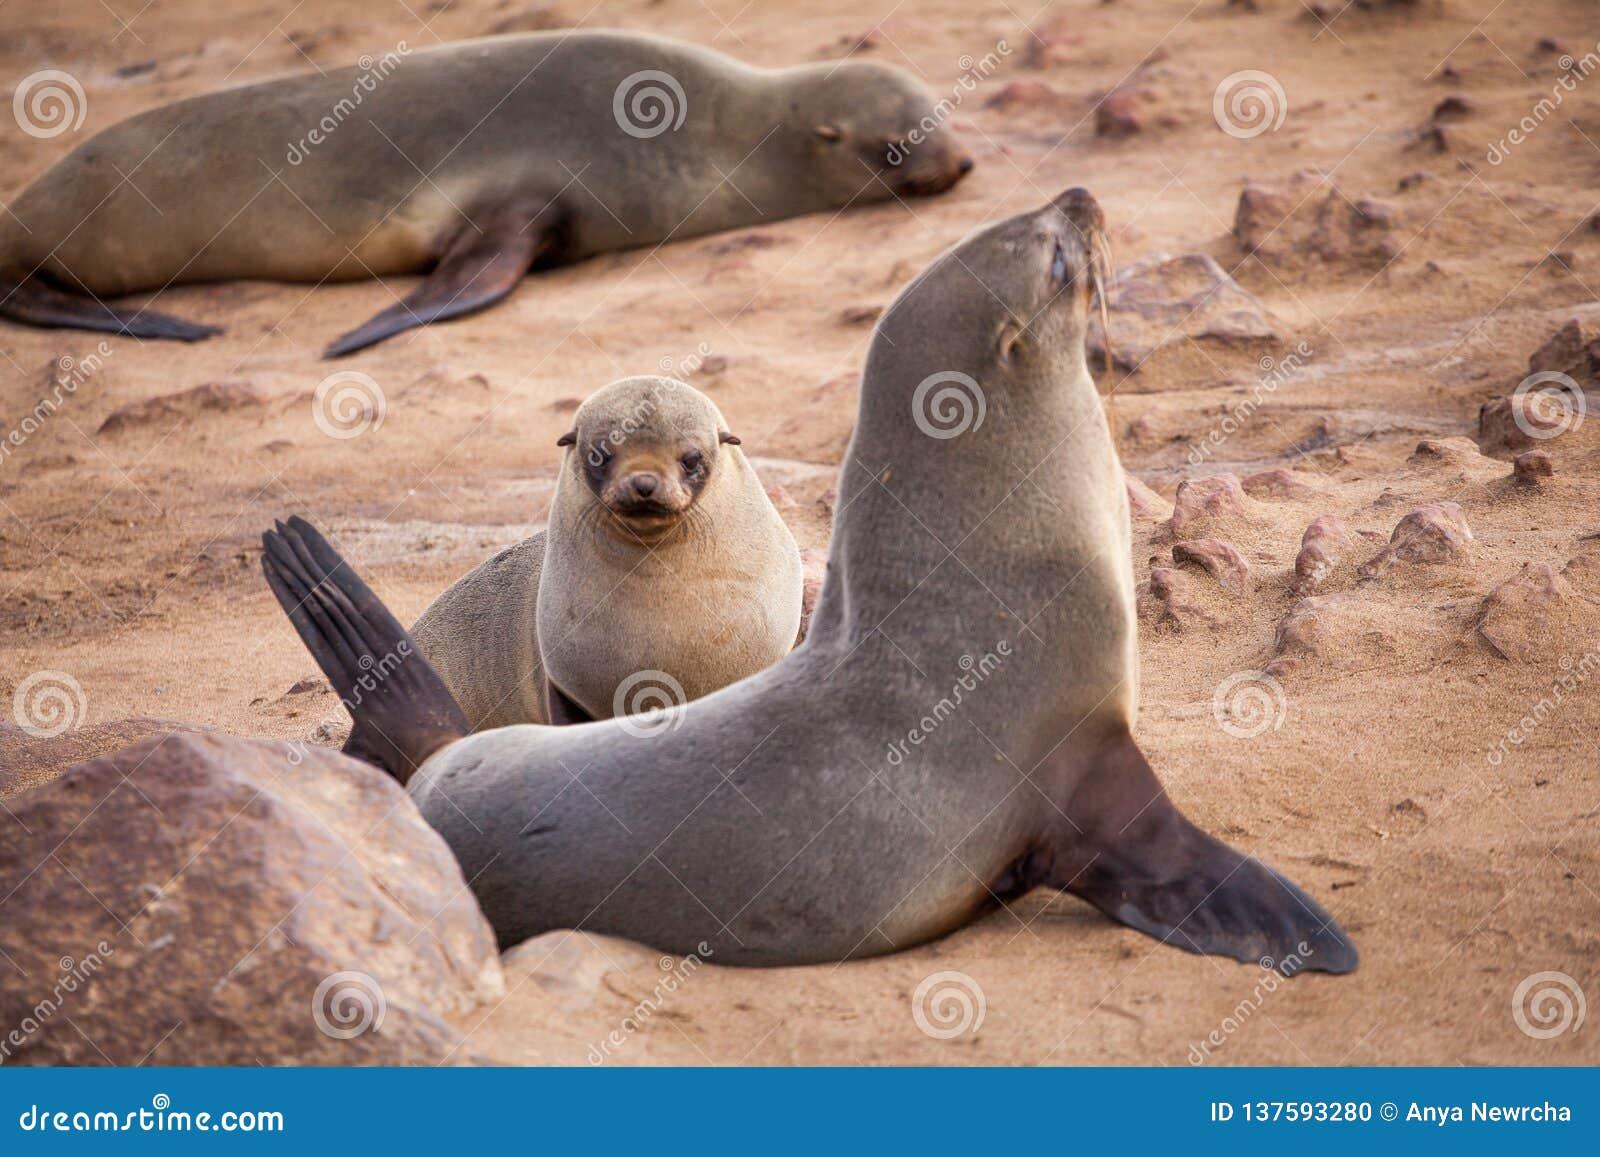 Уплотнения морских львов, Otariinae с щенятами